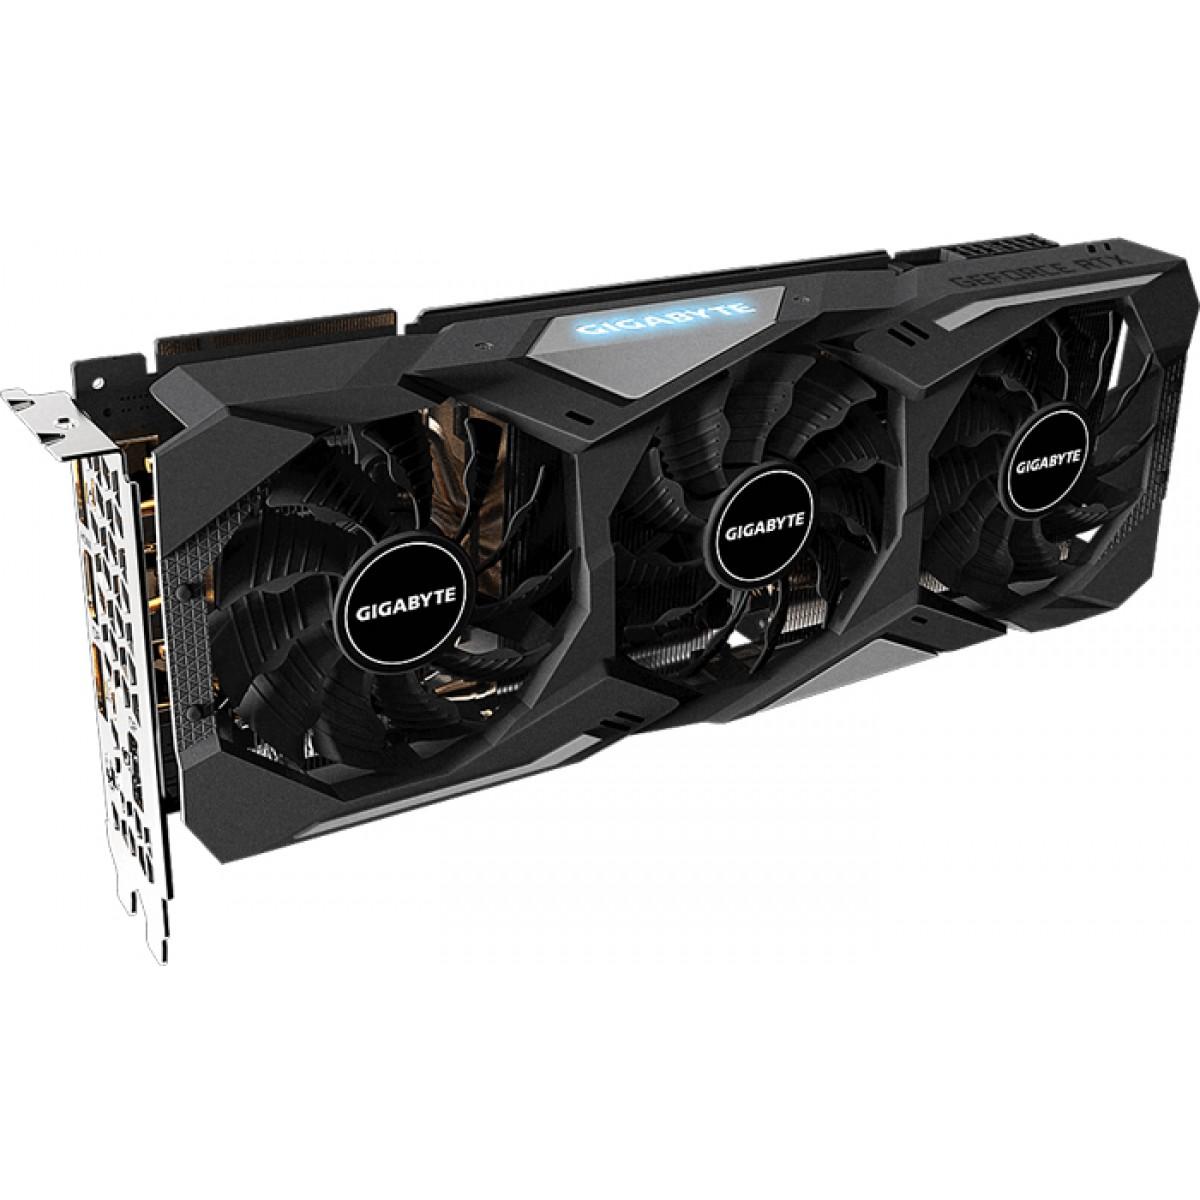 Placa de Vídeo Gigabyte GeForce RTX 2080 Super Gaming OC, 8GB GDDR6, 256Bit, GV-N208SGAMING OC-8GC